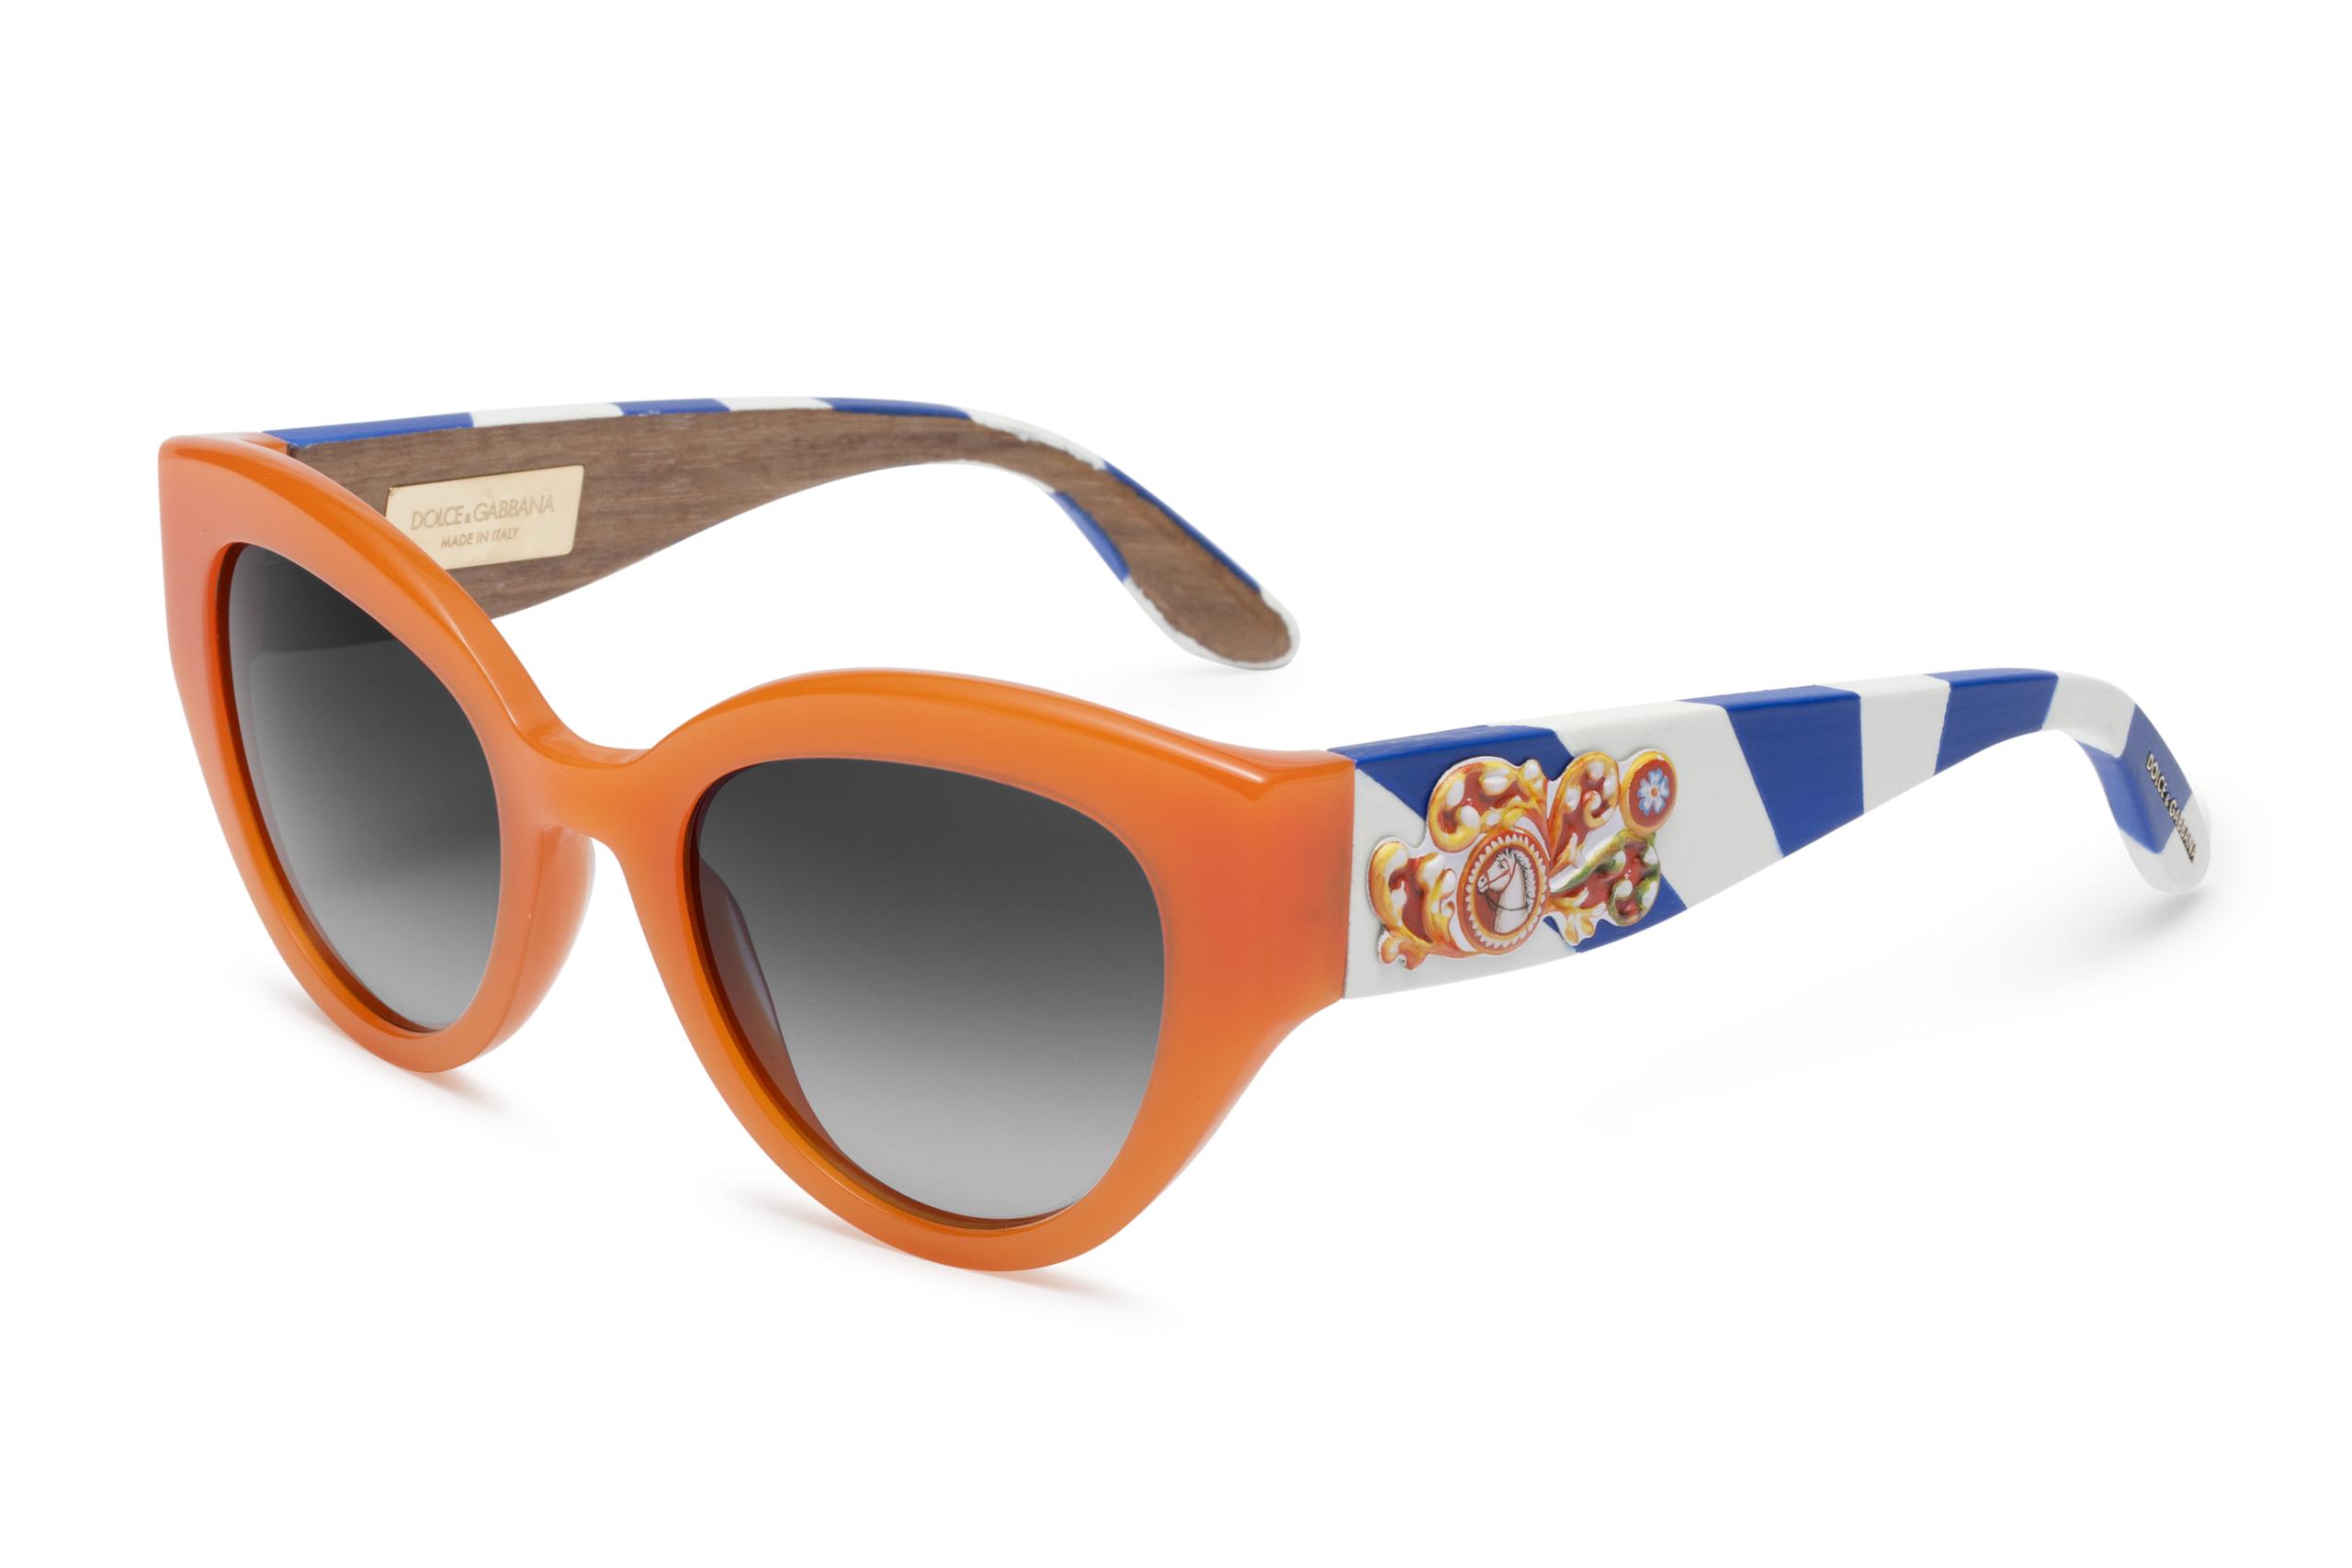 Foto de Gafas de sol Dolce Gabbana Sicilian Carretto (9/12)